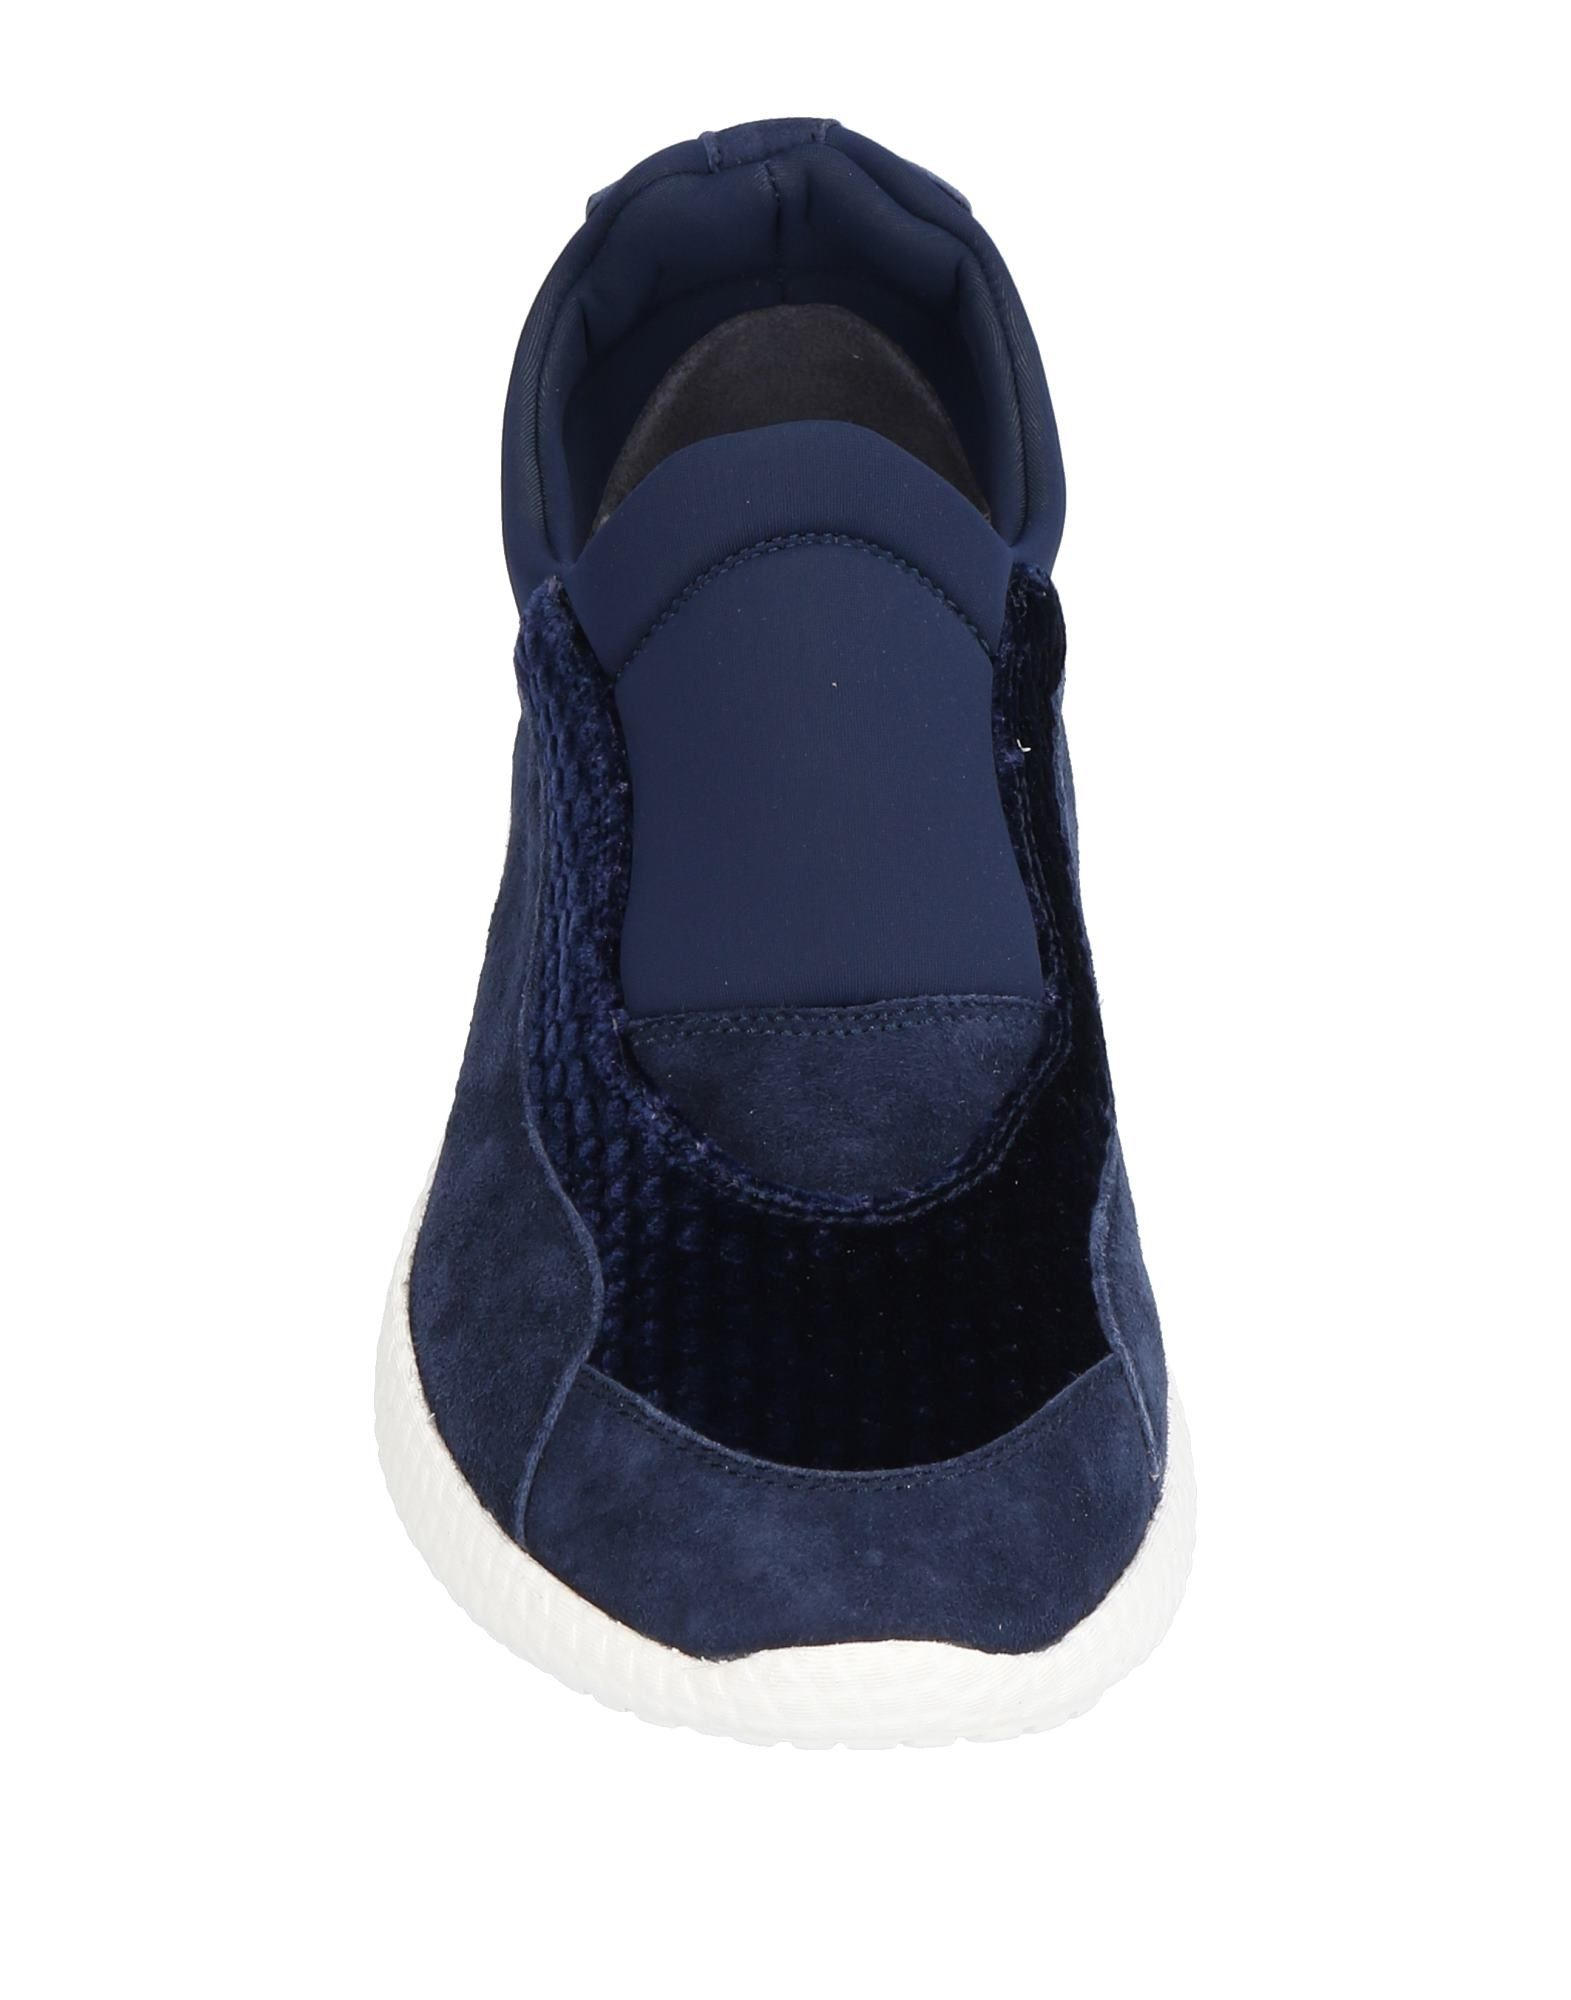 Cesare Paciotti 4Us Gute Sneakers Damen  11508994TQ Gute 4Us Qualität beliebte Schuhe 7e5e30